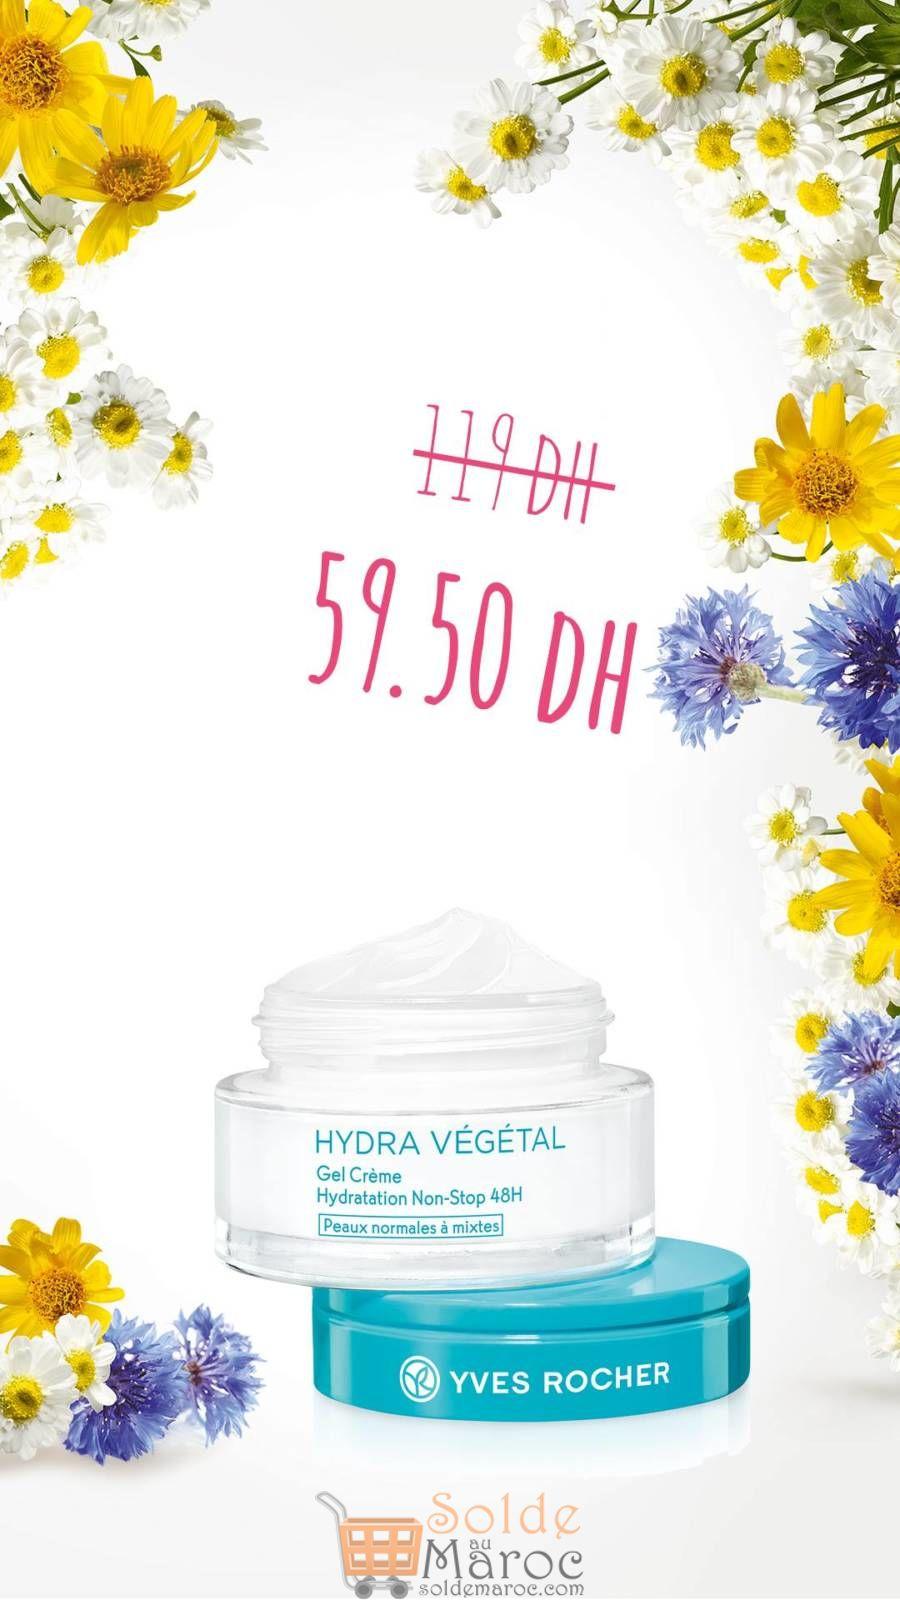 Soldes Yves Rocher Maroc Gamme Hydra Végétal